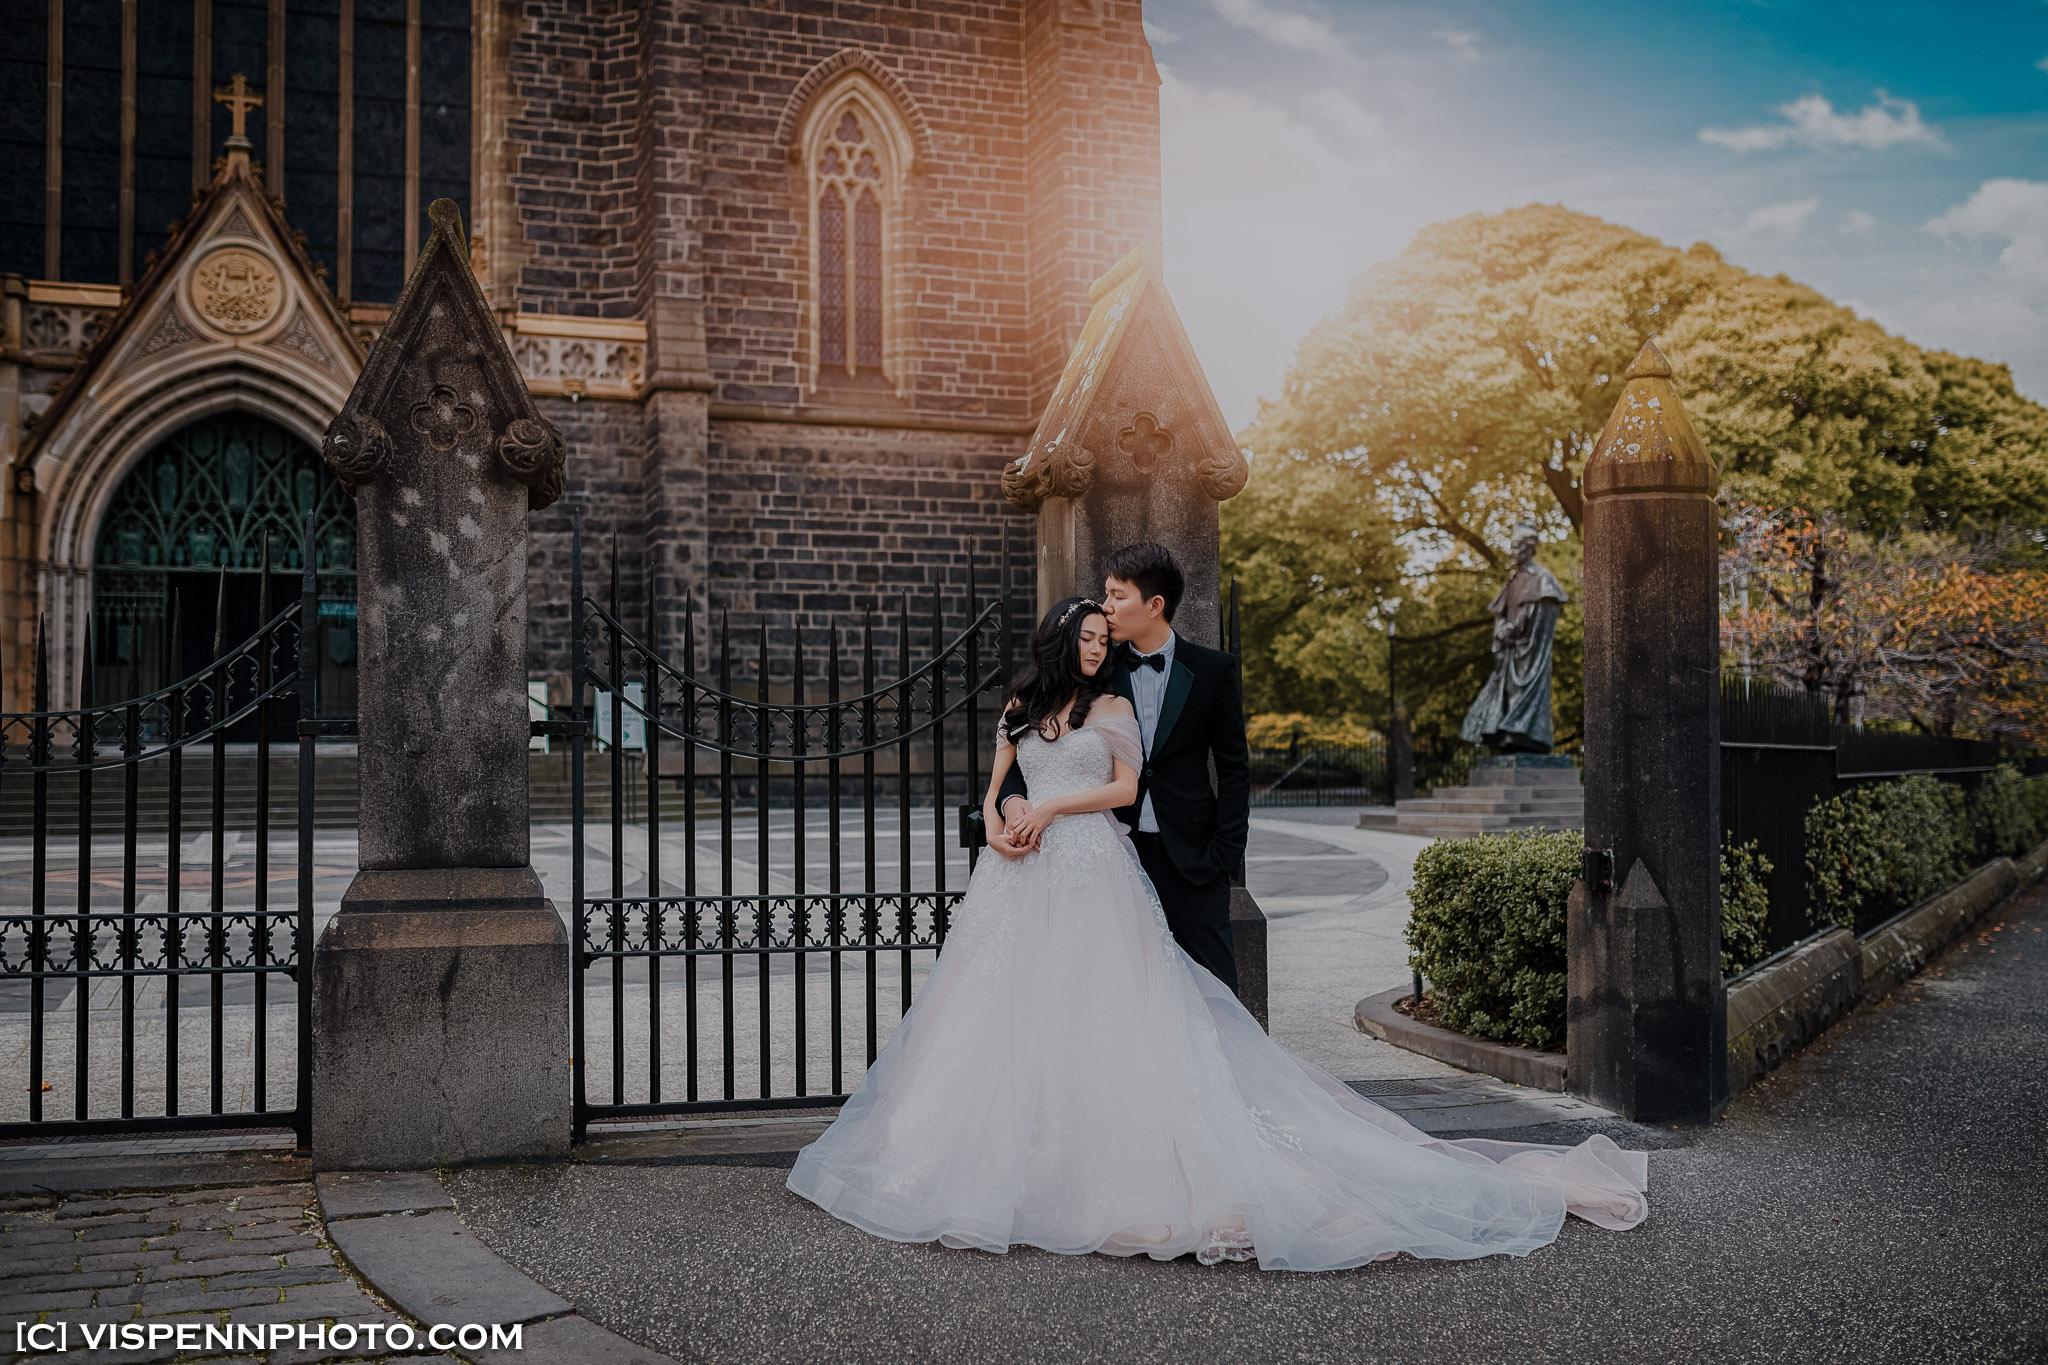 PRE WEDDING Photography Melbourne VISPENN 墨尔本 婚纱照 结婚照 婚纱摄影 VISPENN P5D4 0529